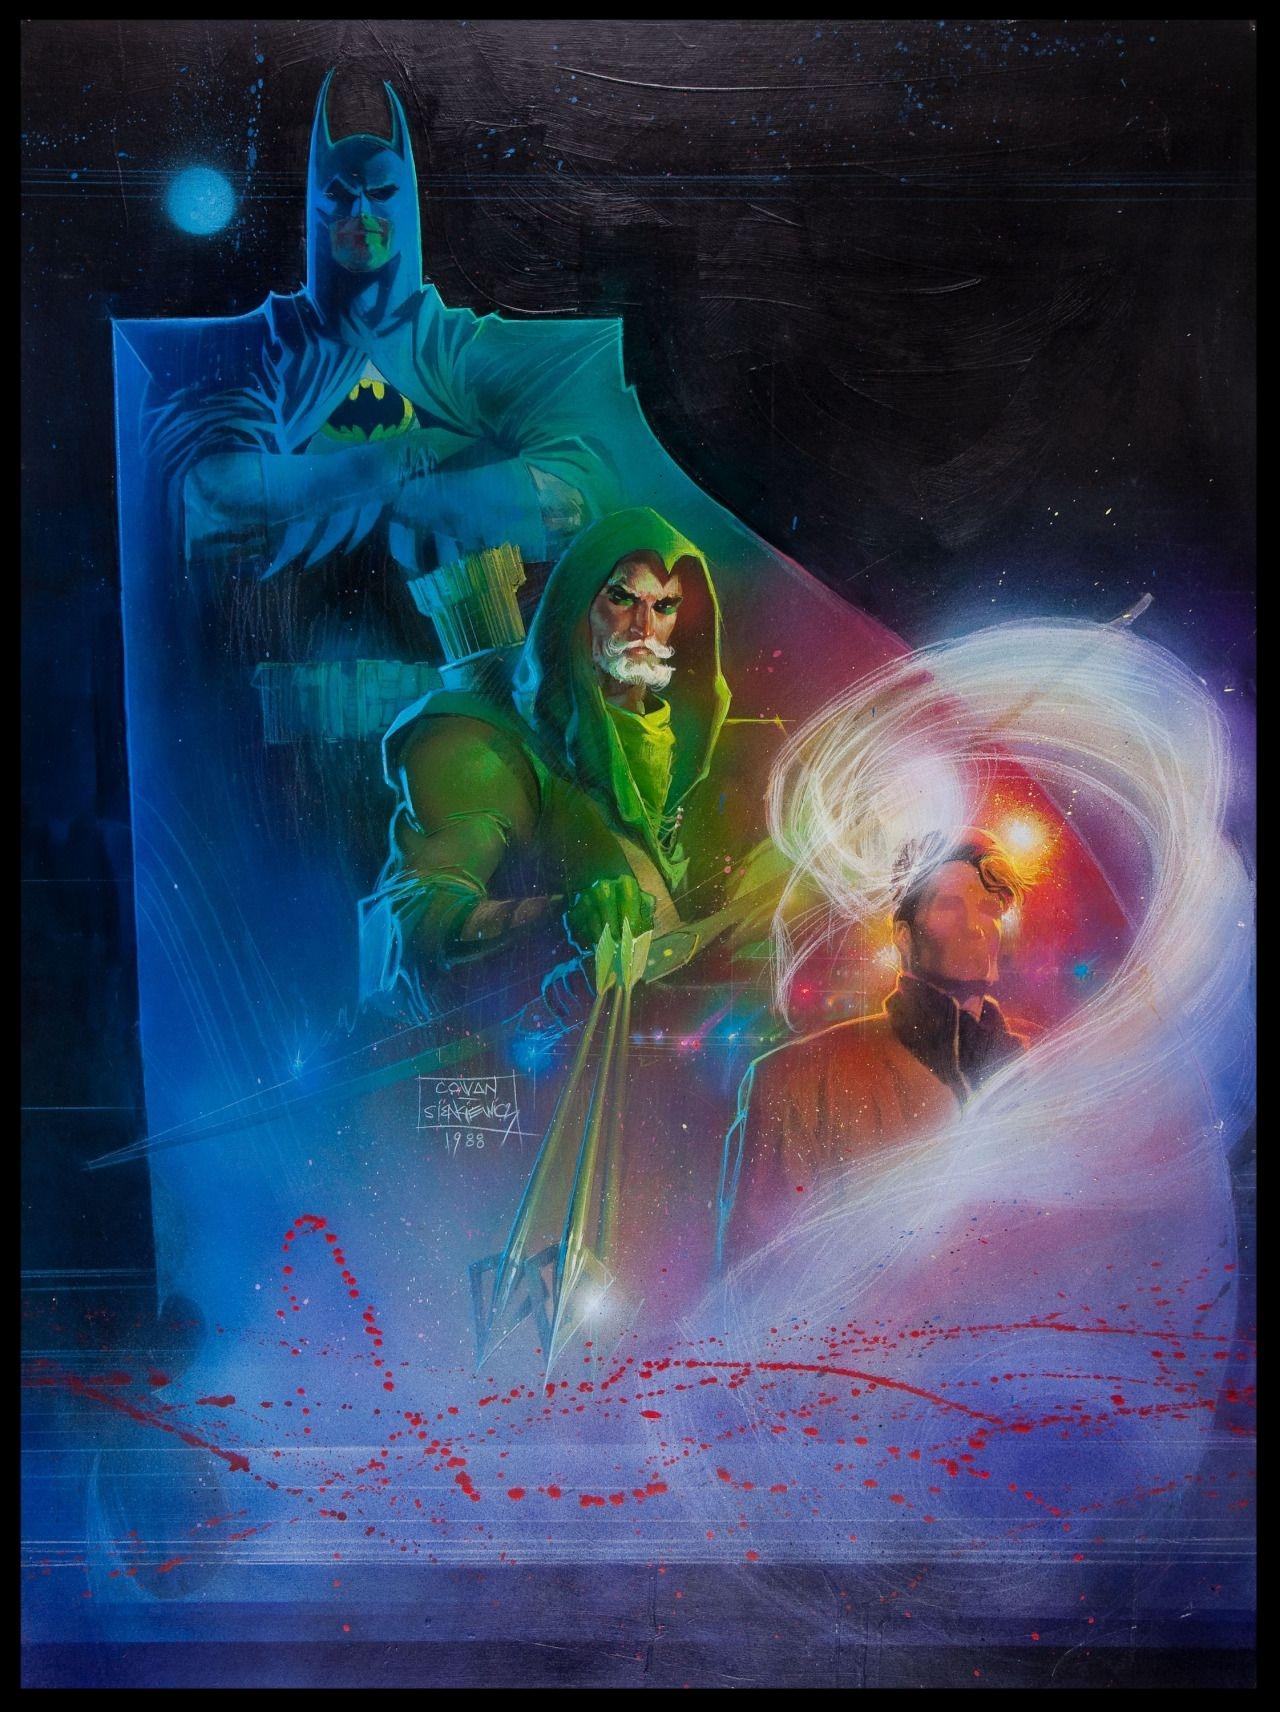 Batman, Arrow & The Question - Poster - Final Color